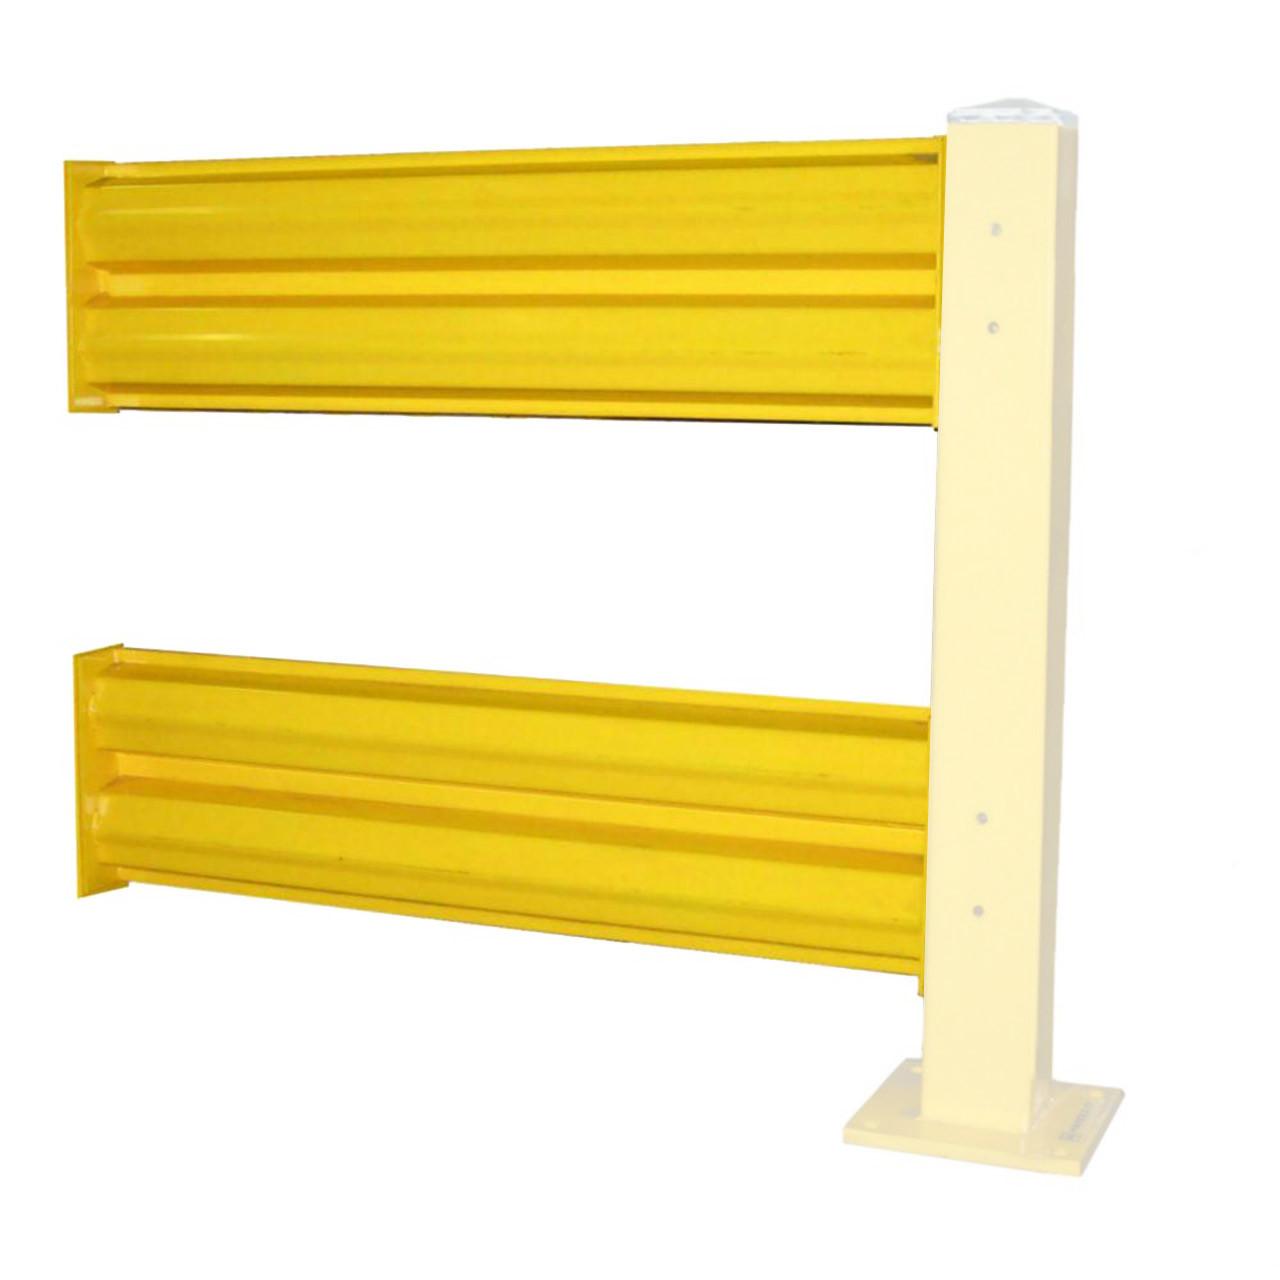 Rails easily mount to Handle It columns